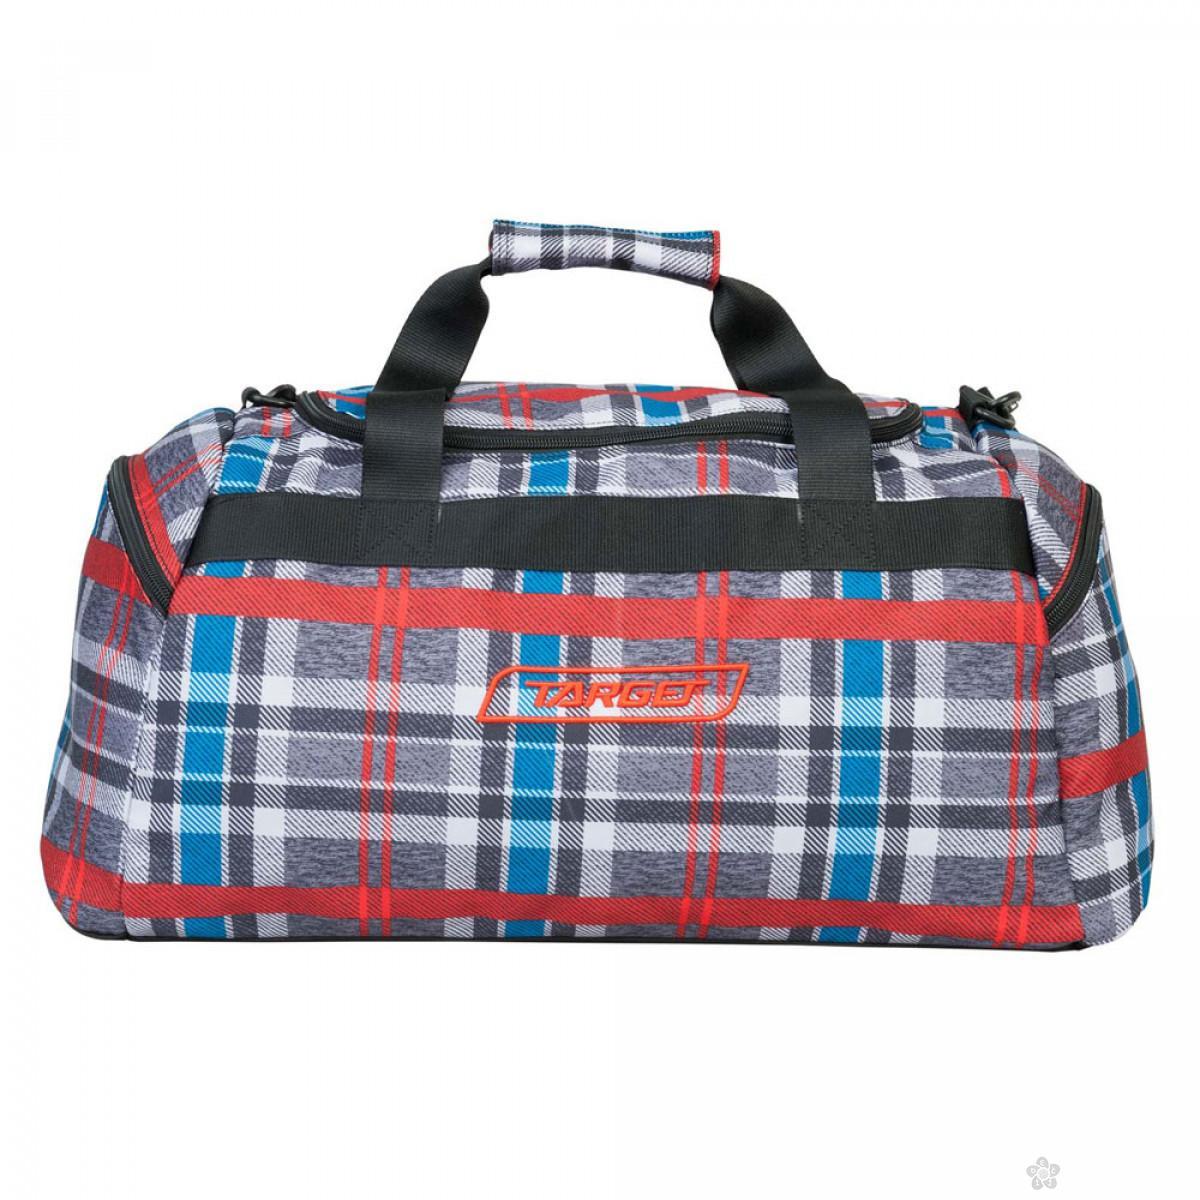 Putna torba Air Pack Gray Chili 21396